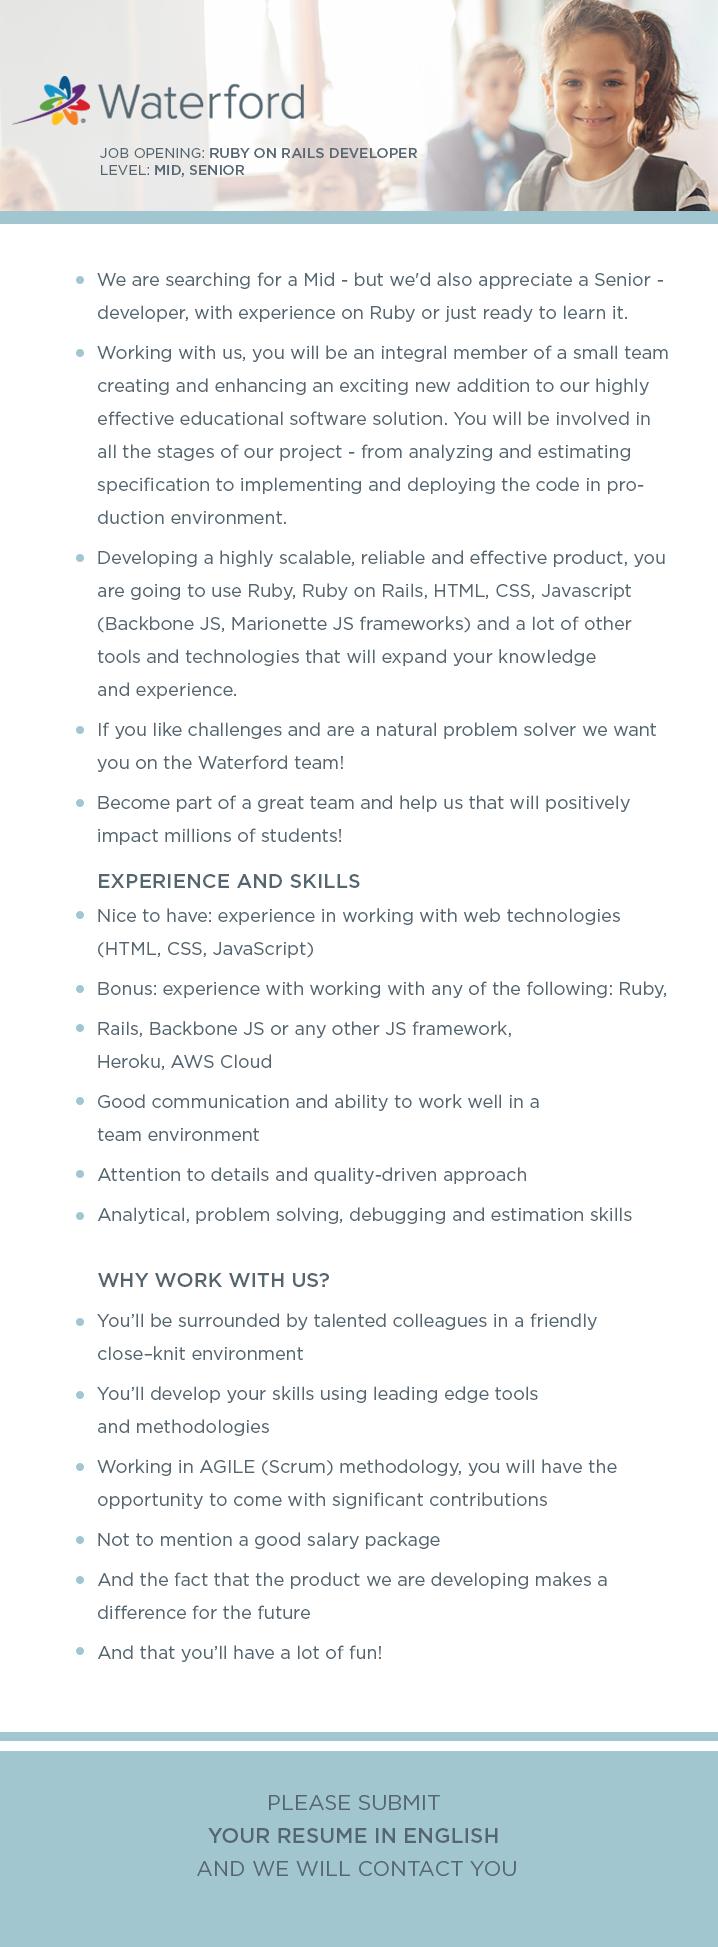 anunt-bestjobs-waterford-ruby-fara-email